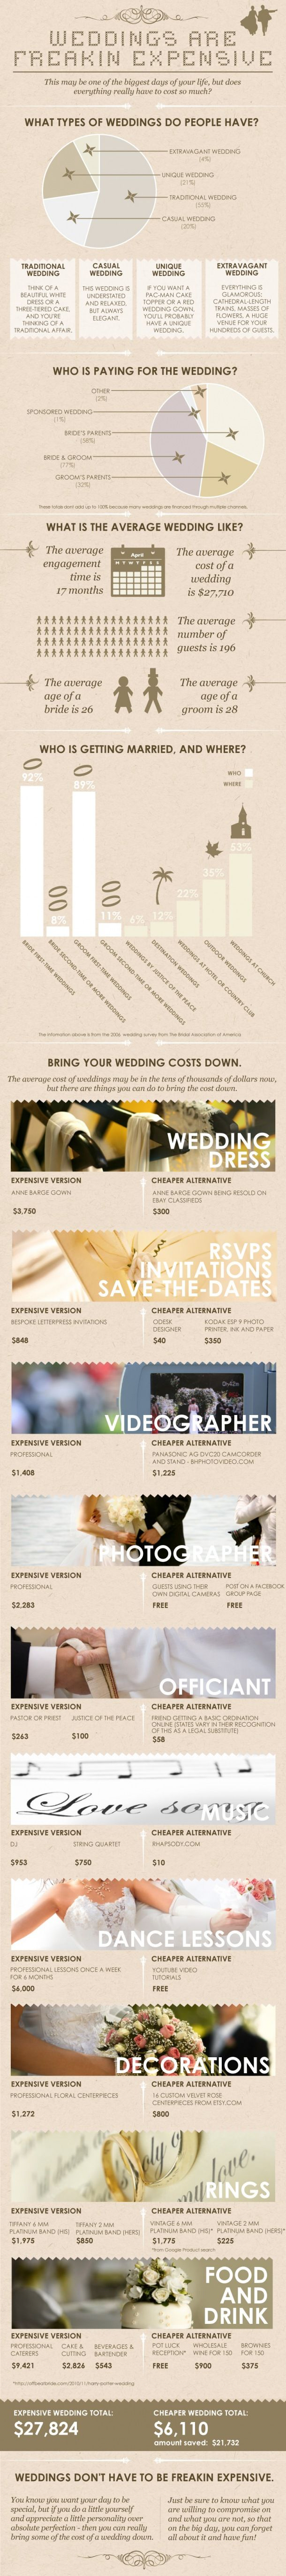 Cheaper tricks to make your wedding less expensive: Wedding Ideas, Wedding Planning, Wedding Stuff, Dream Wedding, Wedding Expense, Wedding Costs, Future Wedding